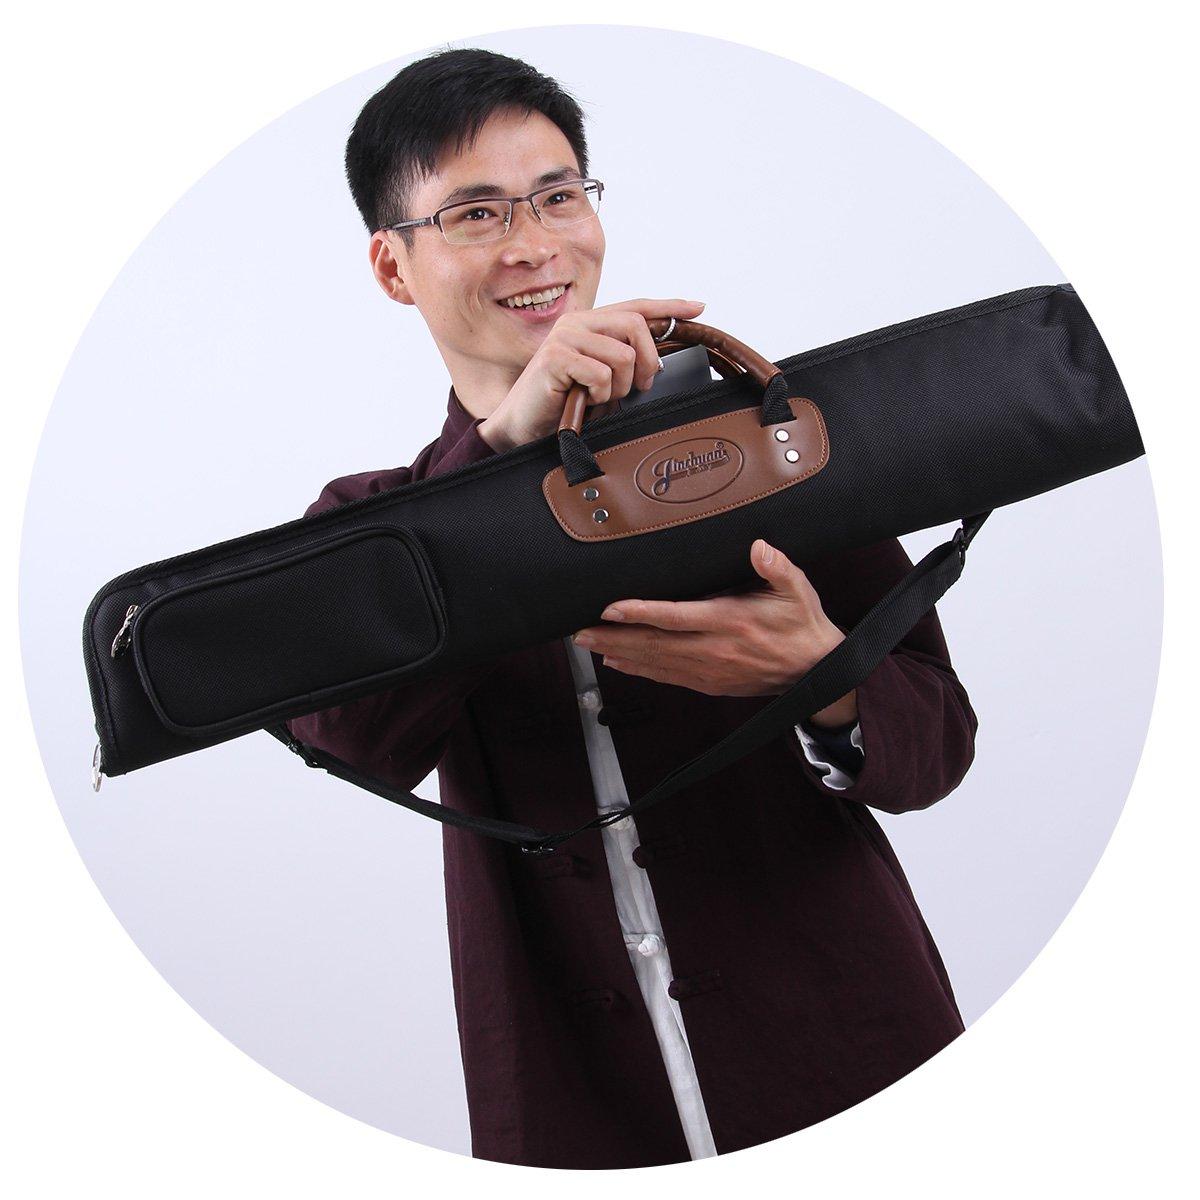 Jiuxun Soprano Saxophone Bag & Case 1200D Water-resistant Oxford Cloth bB Saxes handbag and Backpack Jinchuan 4334279290